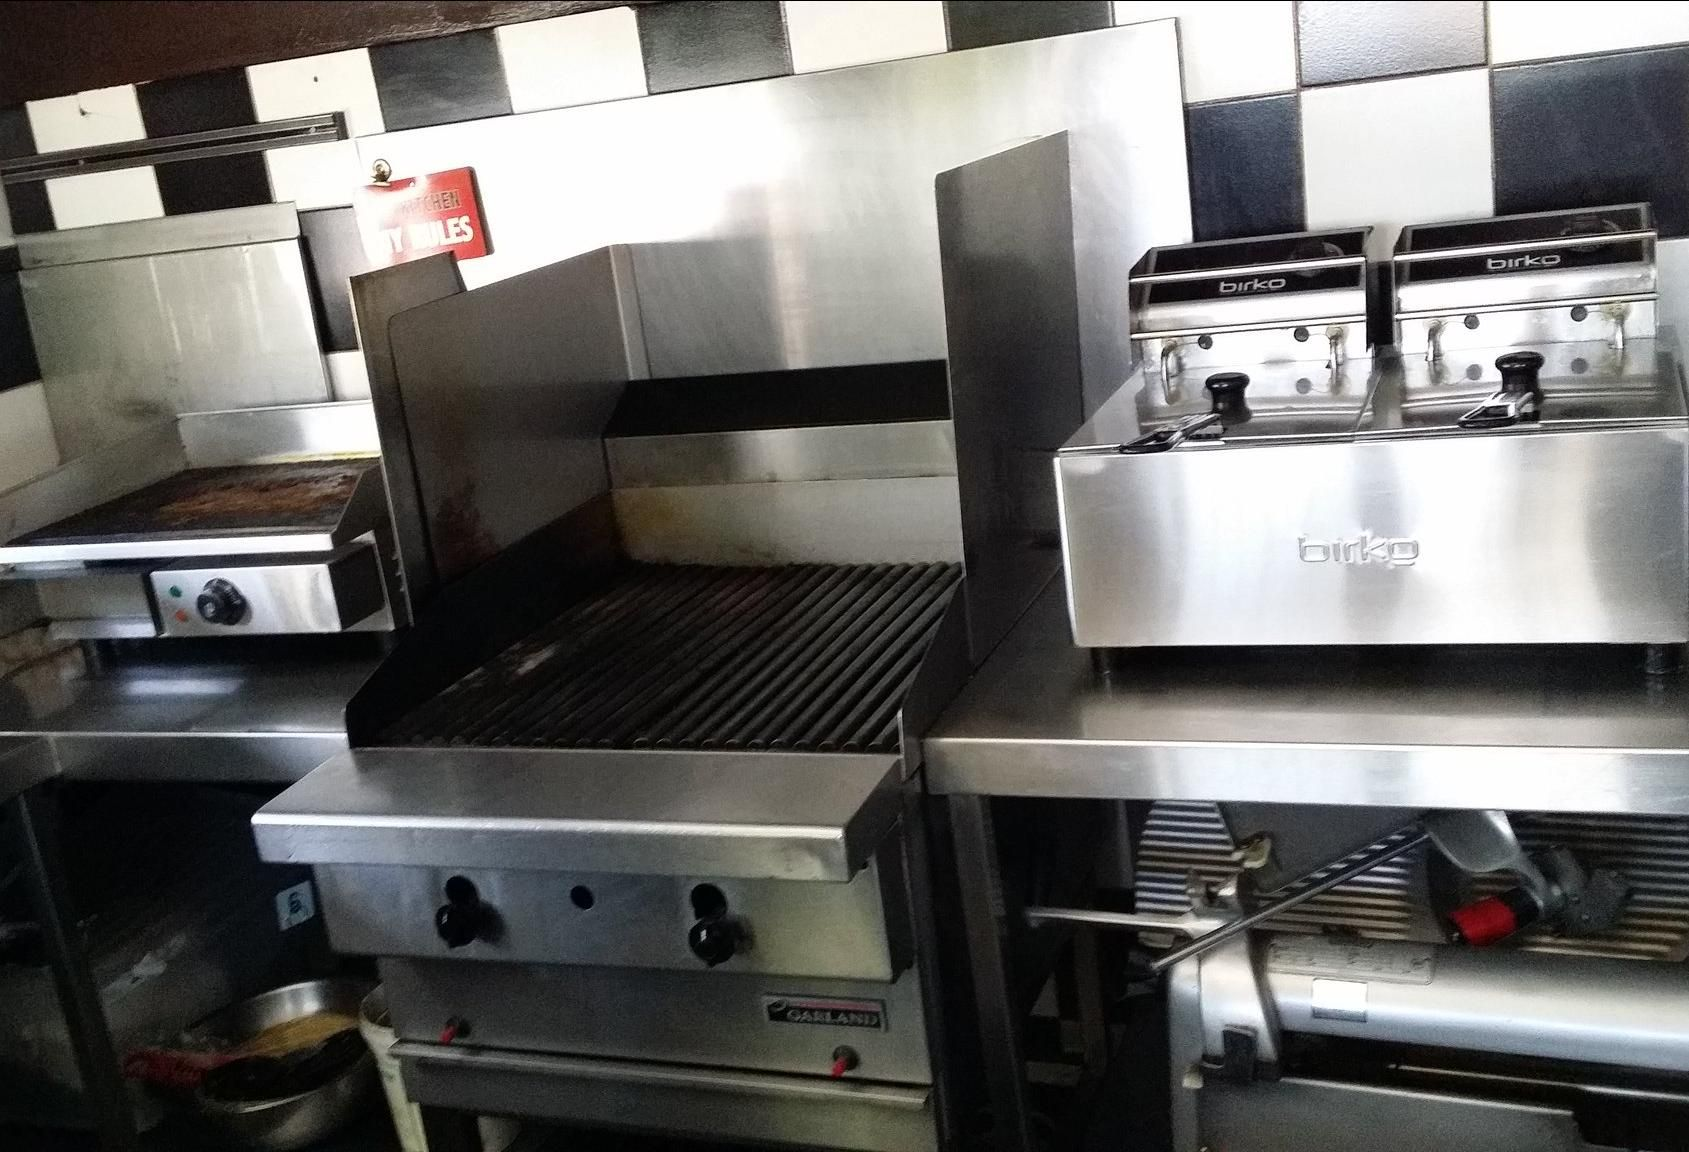 Percentage-Based Rents, Ghost Kitchens Gaining Appeal For Struggling Restaurants